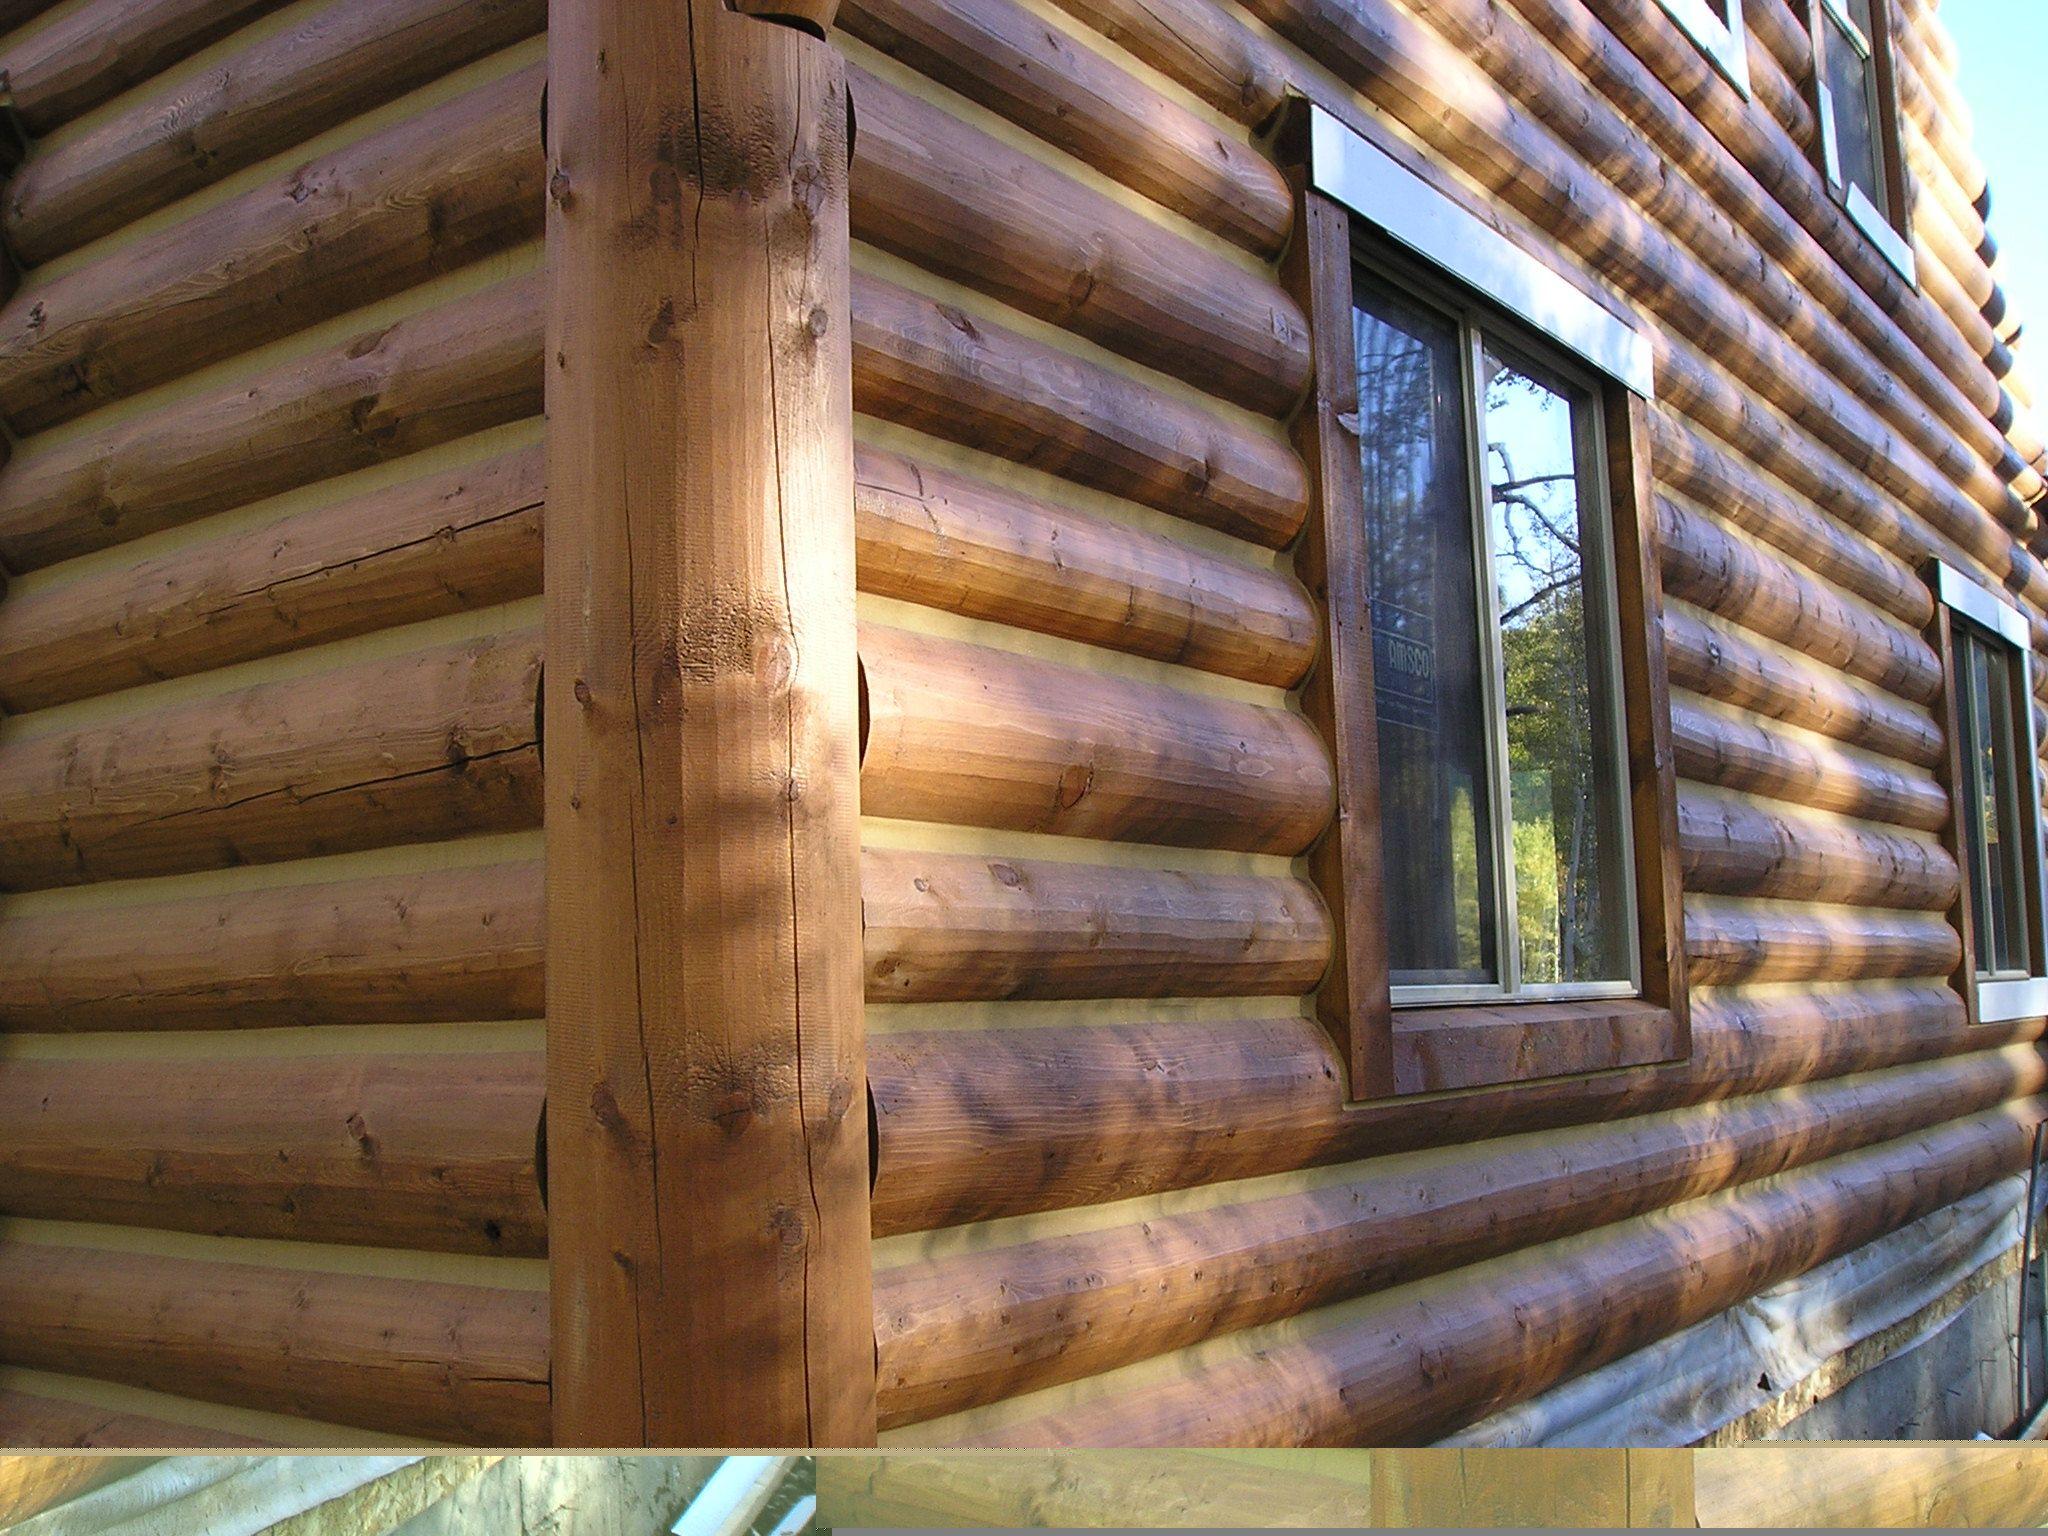 We Sale Log And Timber Products Half Log Siding Timber Siding And Custom Milled Logs And Timbers Custom Built Timber Trusses Log Siding Timber Stair Log Homes